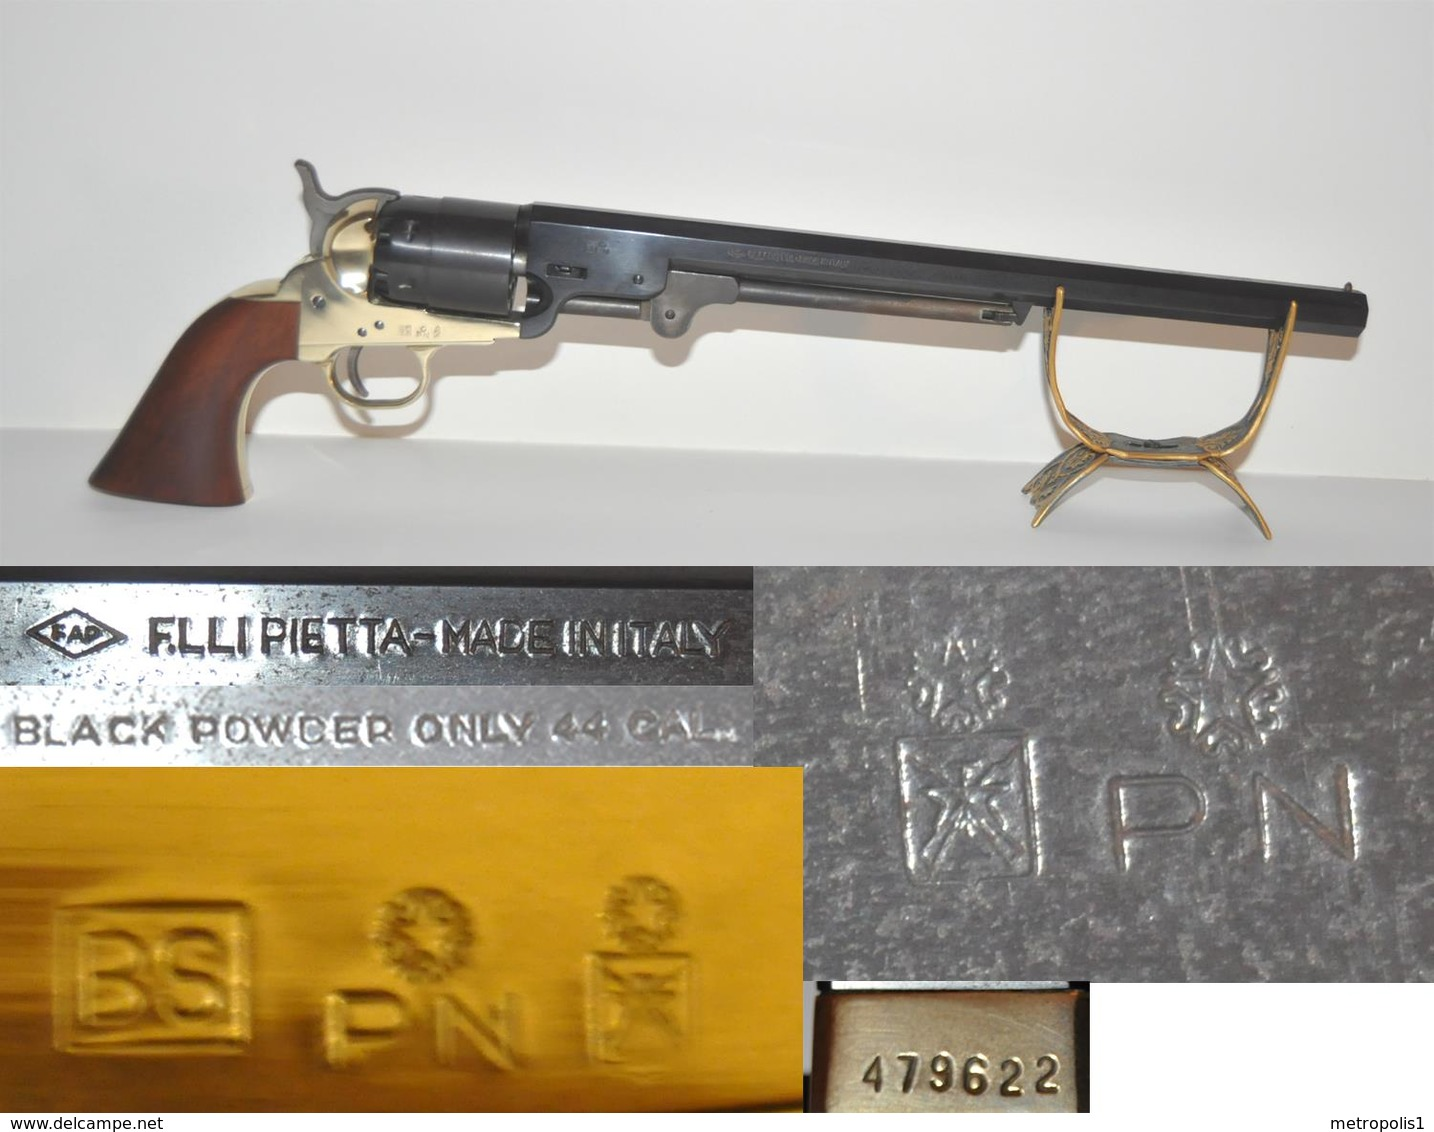 Réplique Colt Pietta Navy Made In Italy Black Powder Only Cal. 44 Canon Long - Army & War